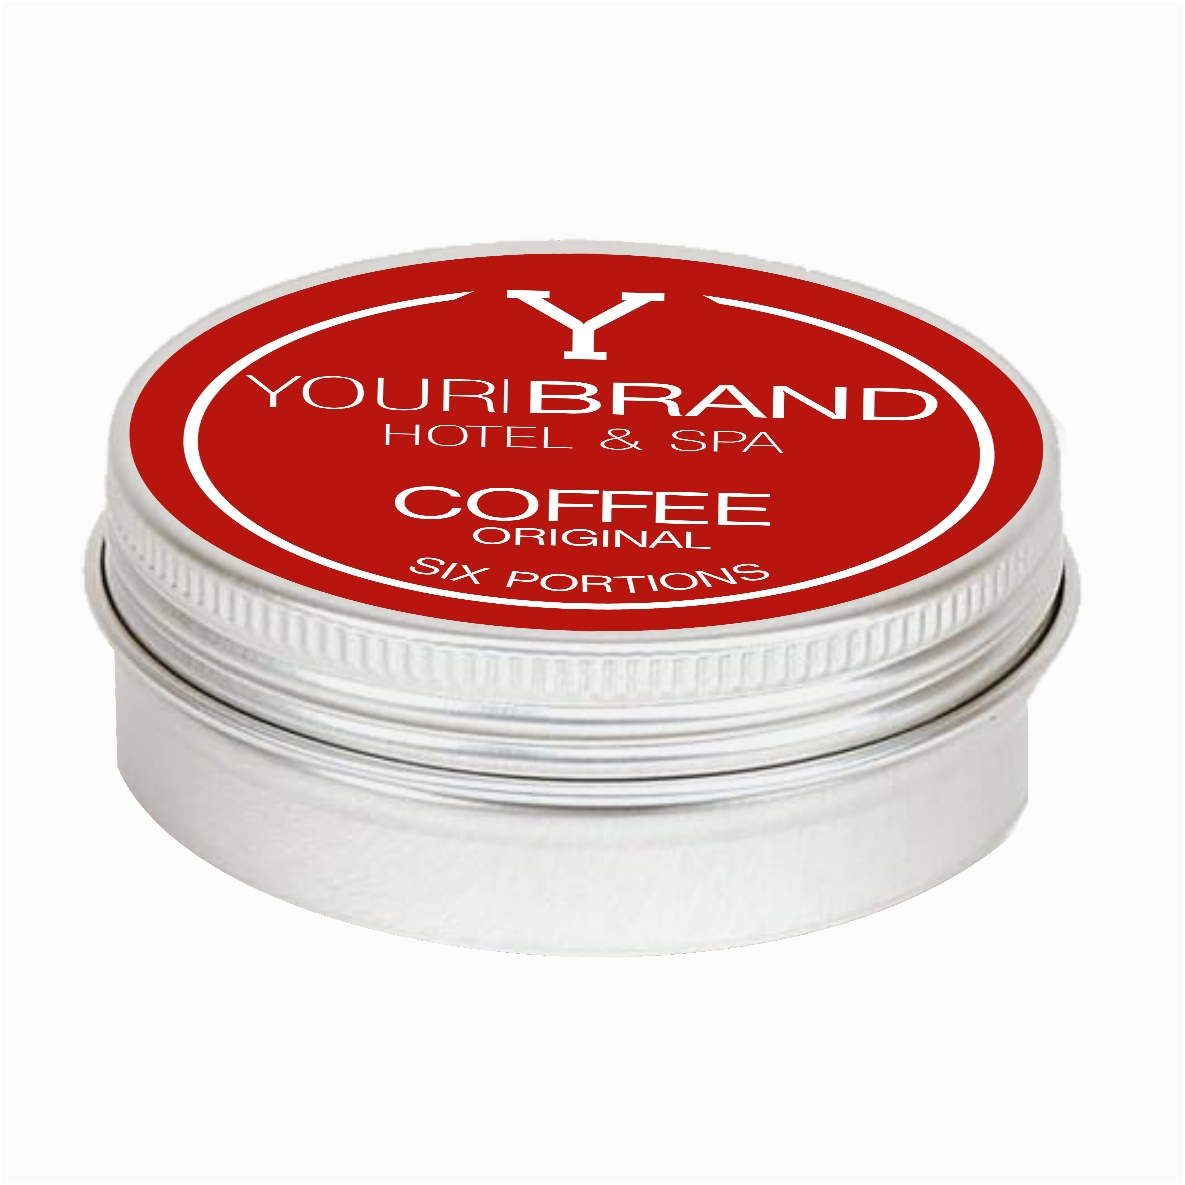 bespoke hotel coffee, customised hotel coffee, premium hospitality coffee, coffee tin, hotel coffee